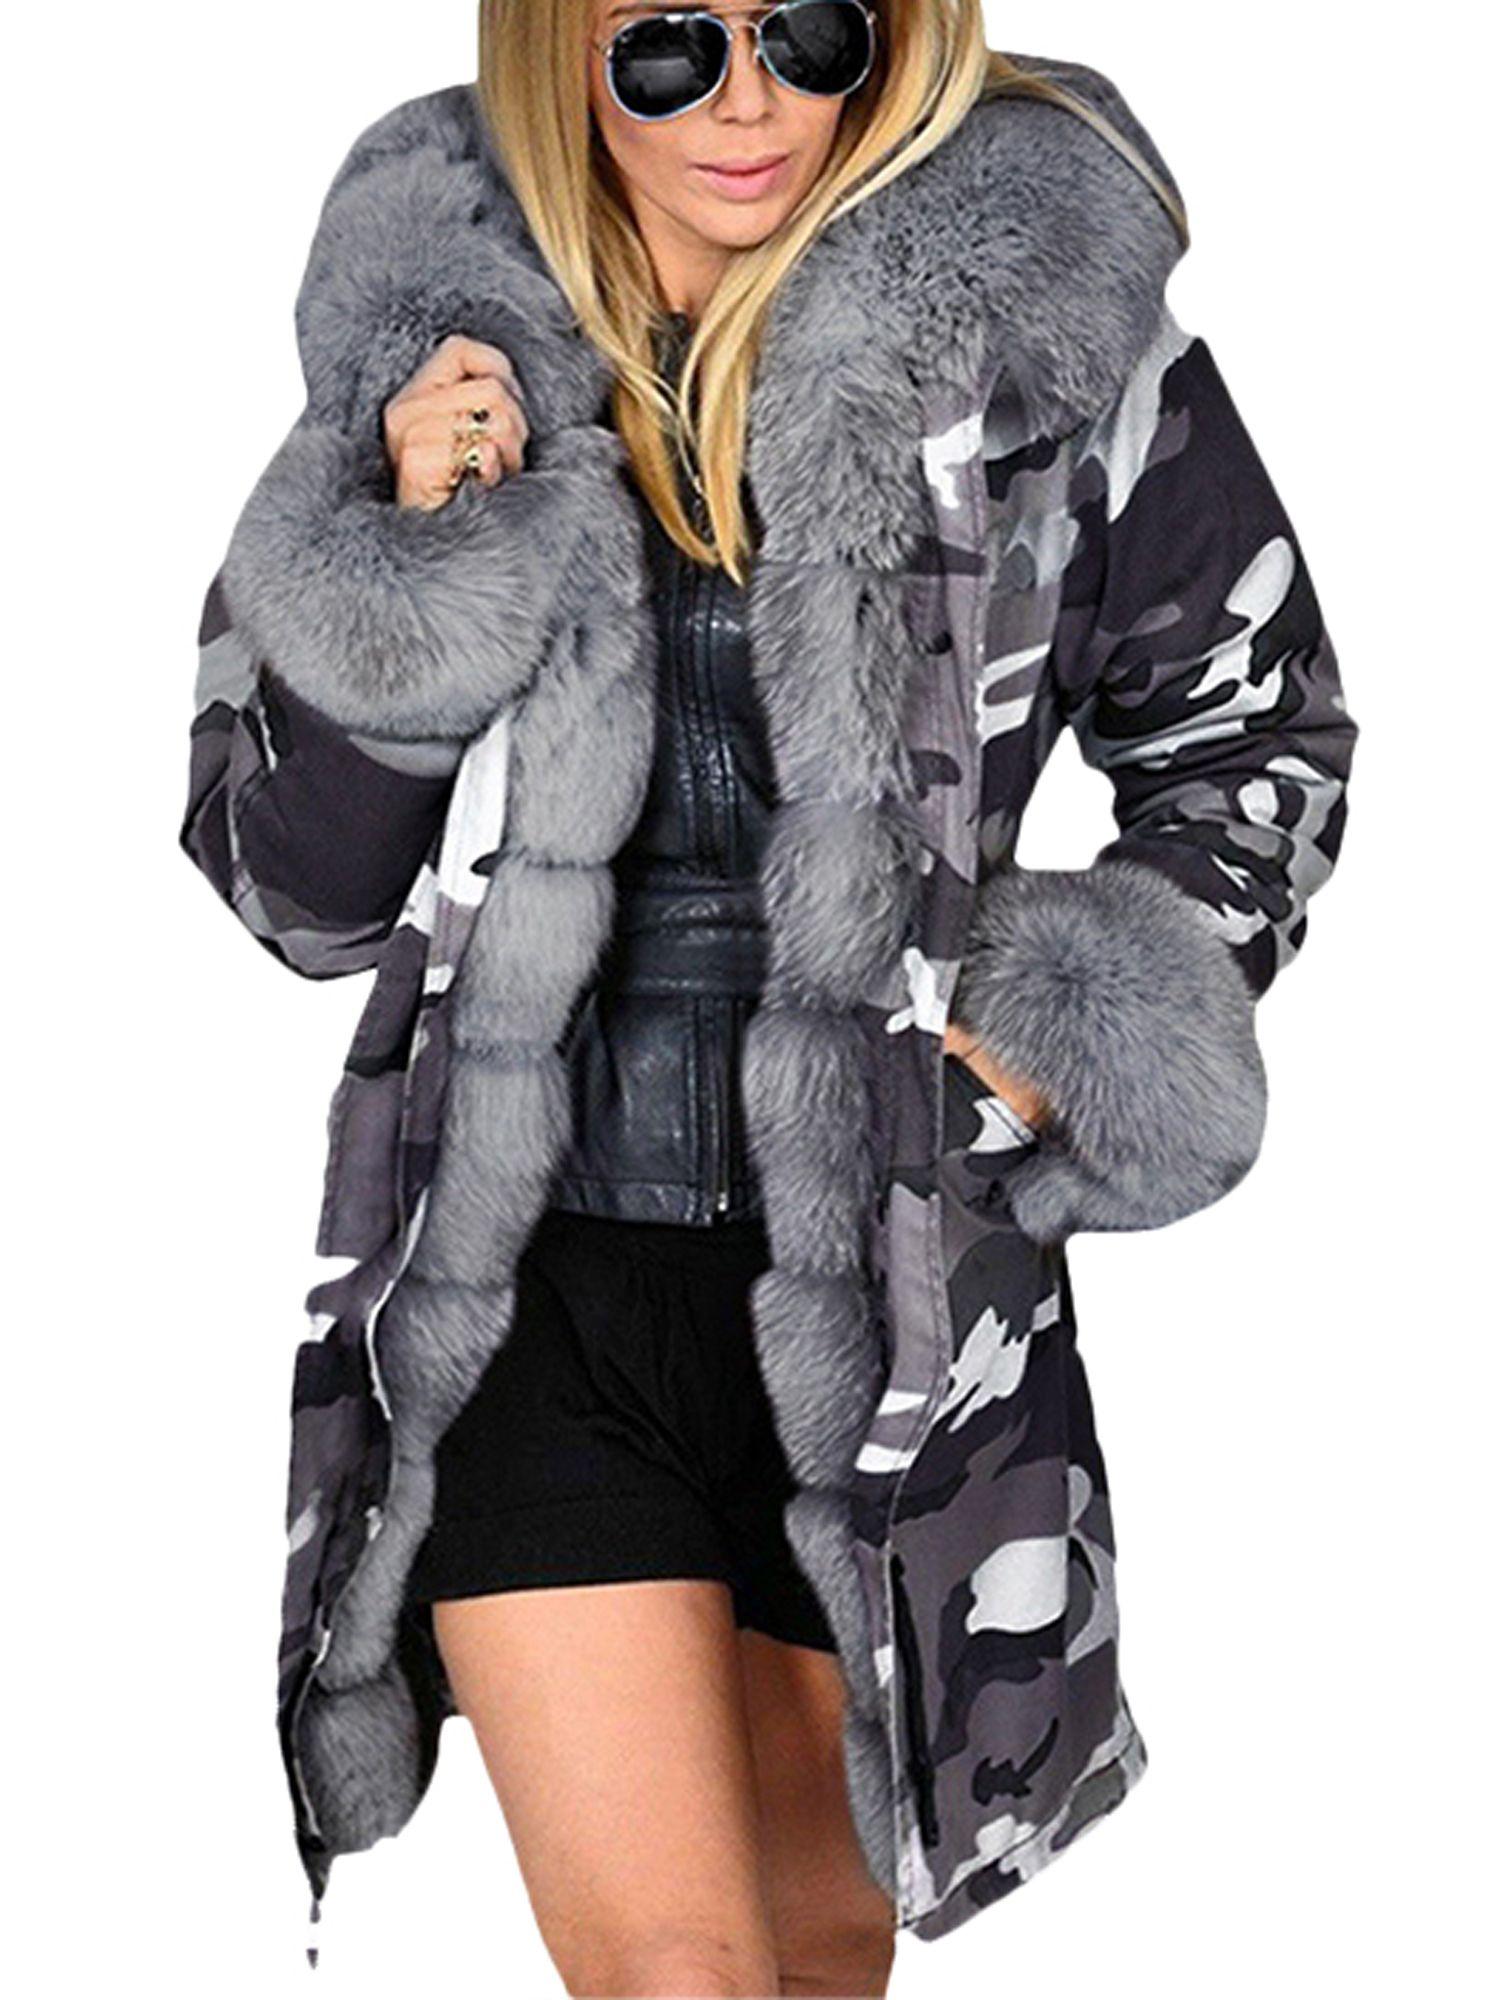 Lallc Women S Cardigan Parka Fleece Thick Warm Winter Hooded Midi Outerwear Coats Walmart Com In 2021 Winter Coats Women Winter Fashion Outfits Womens Cardigan [ 2000 x 1500 Pixel ]